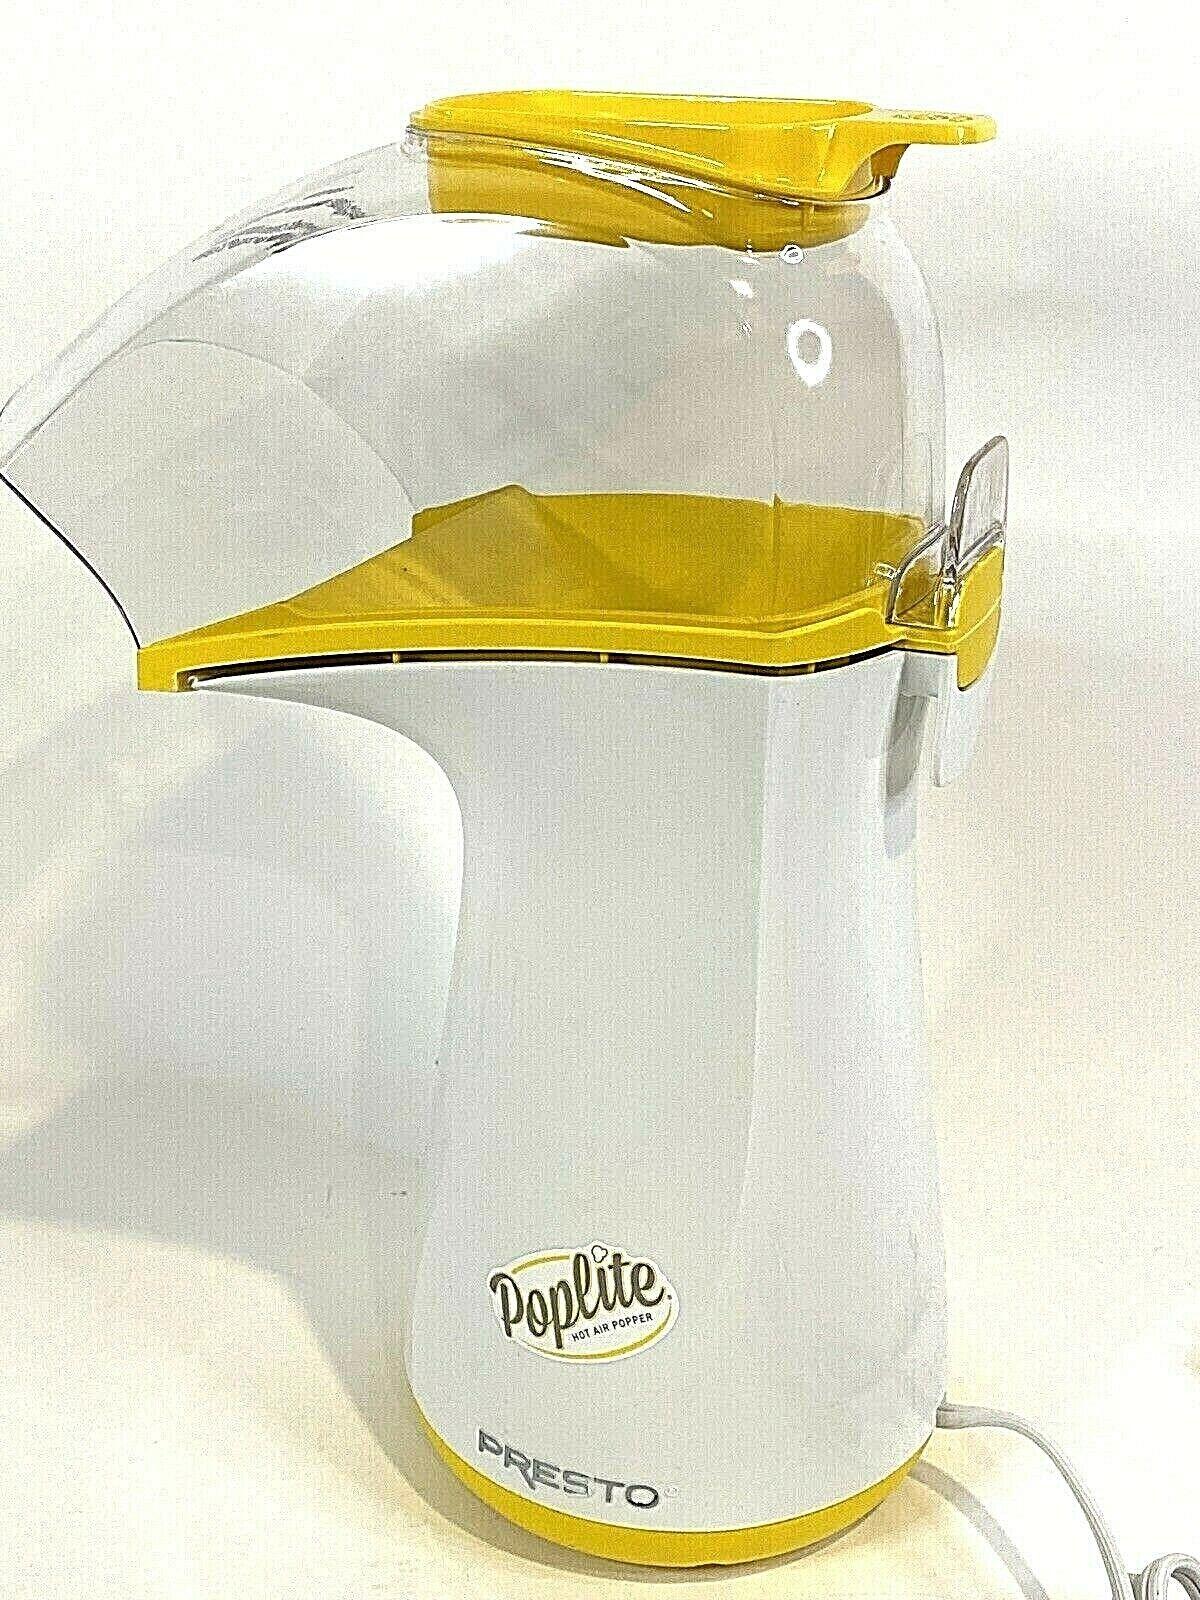 PRESTO PopLite Hot Air Corn Popper MODEL #04820 - Excellent